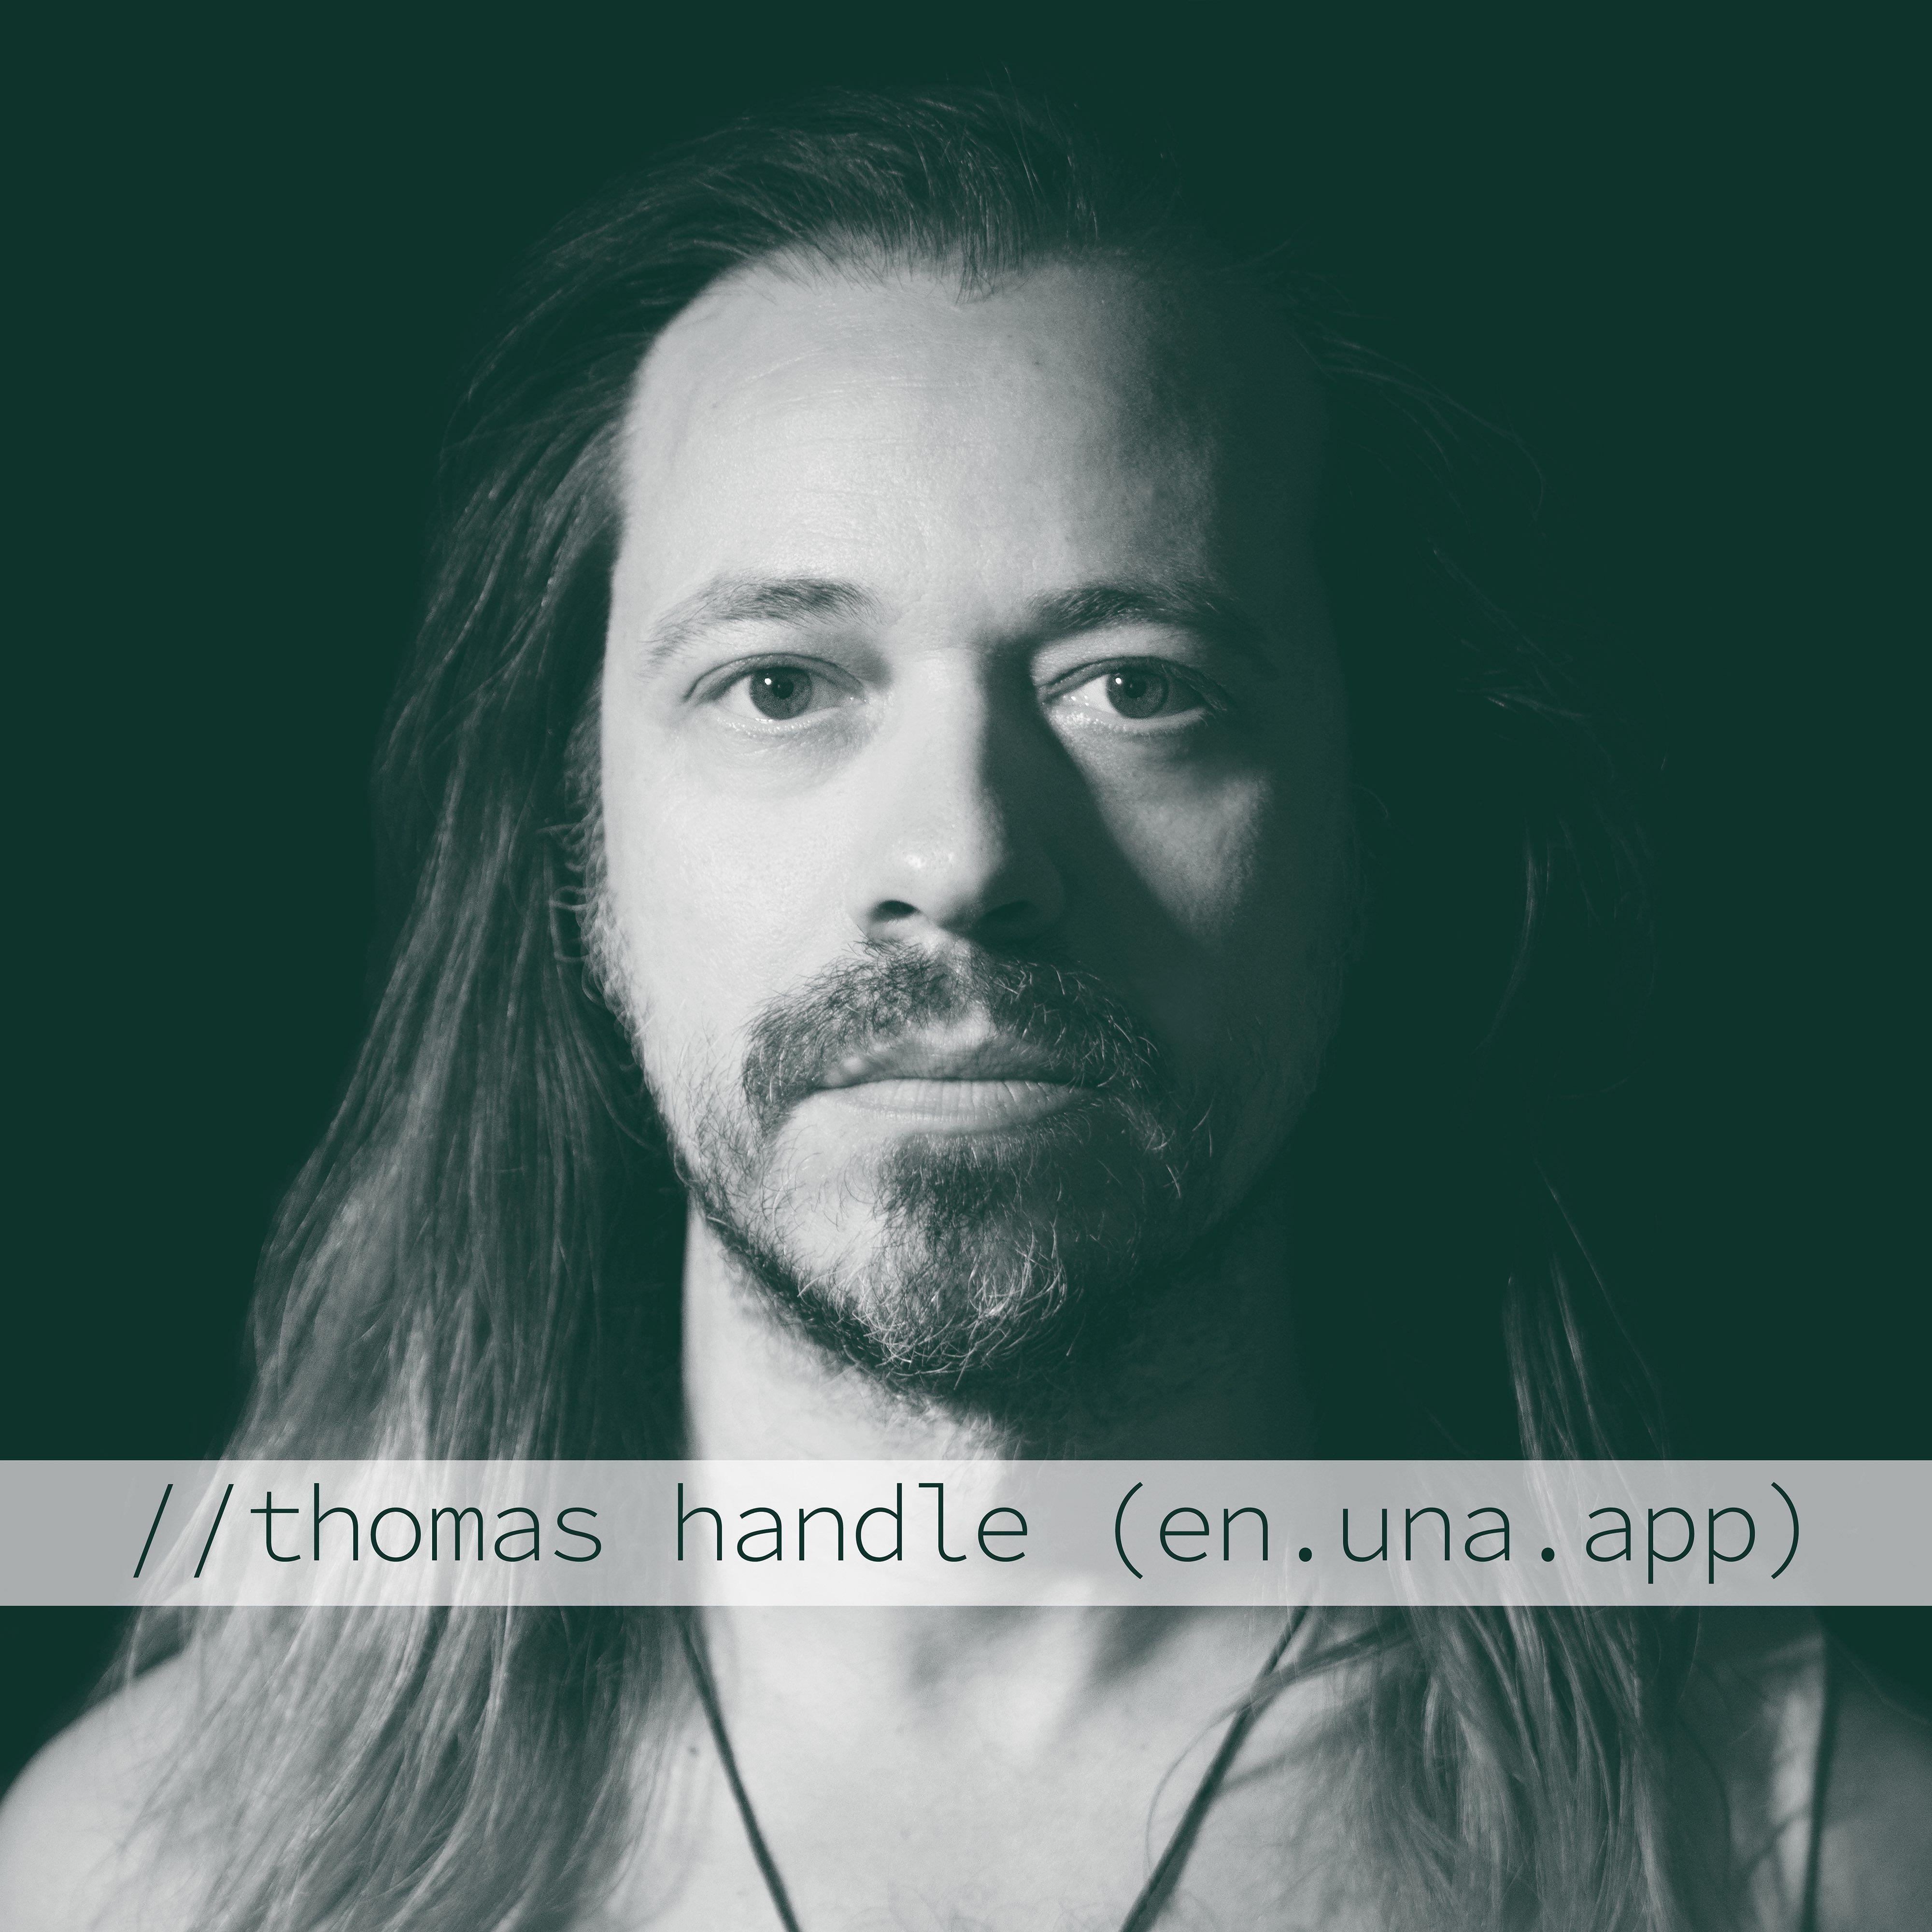 Thomas Handle